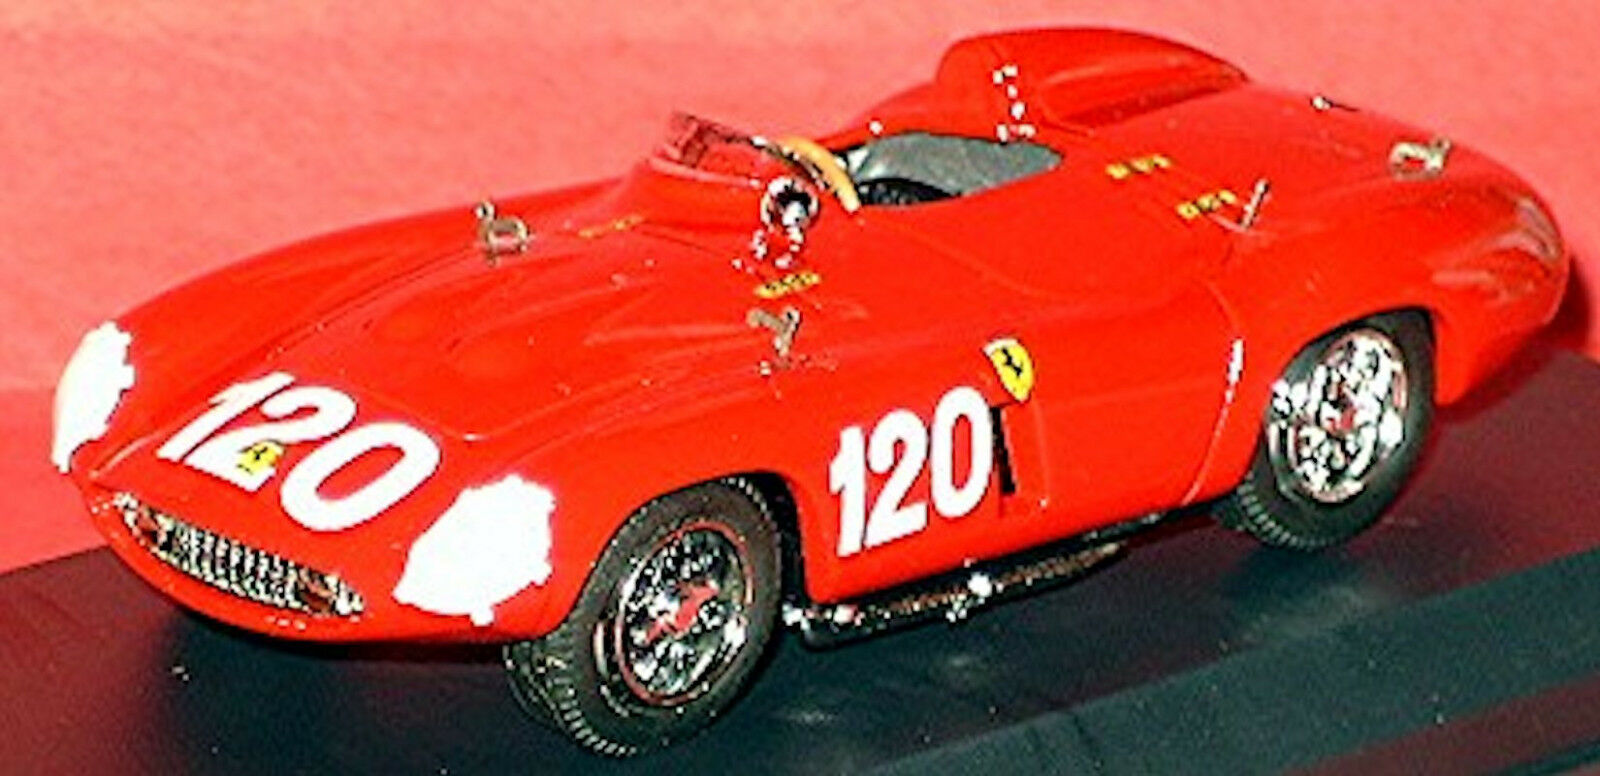 nuevo estilo Ferrari 750 750 750 Monza Targa Florio 1955  120 Rojo Rojo 1 43 Mejor Box  alto descuento